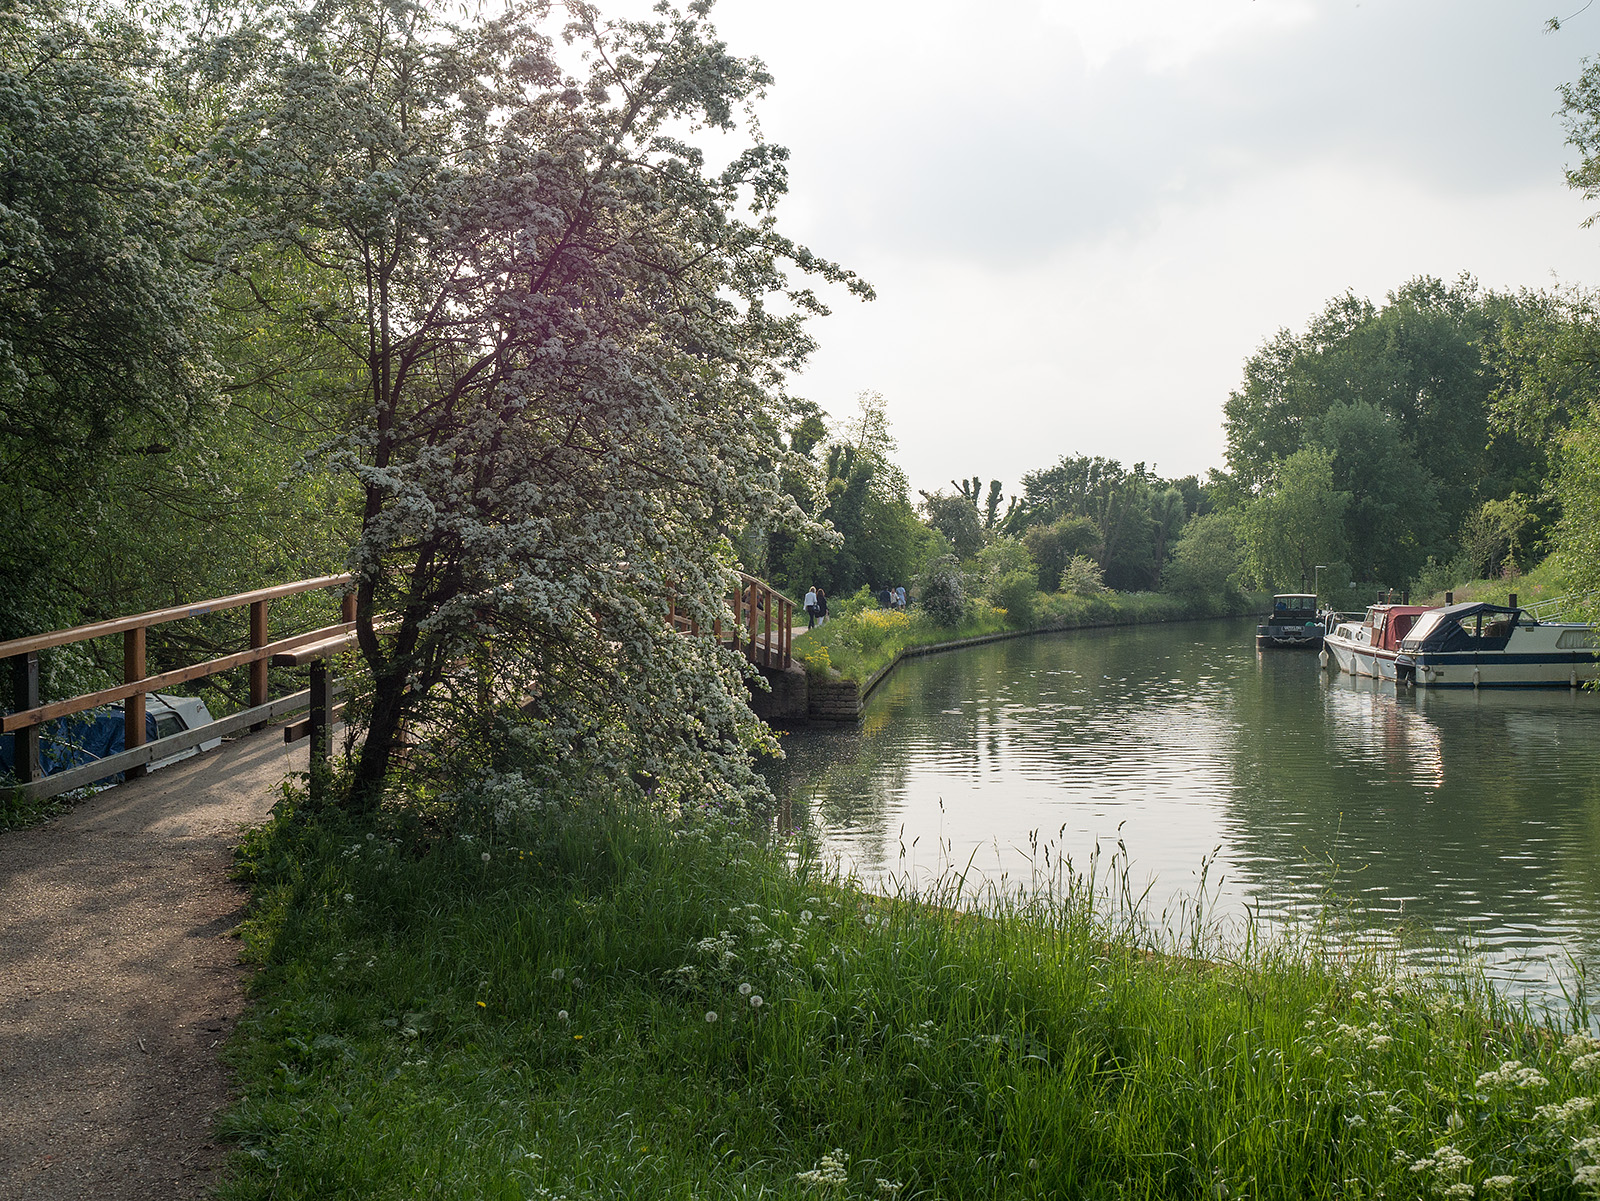 Bridge near Bodleian libraries